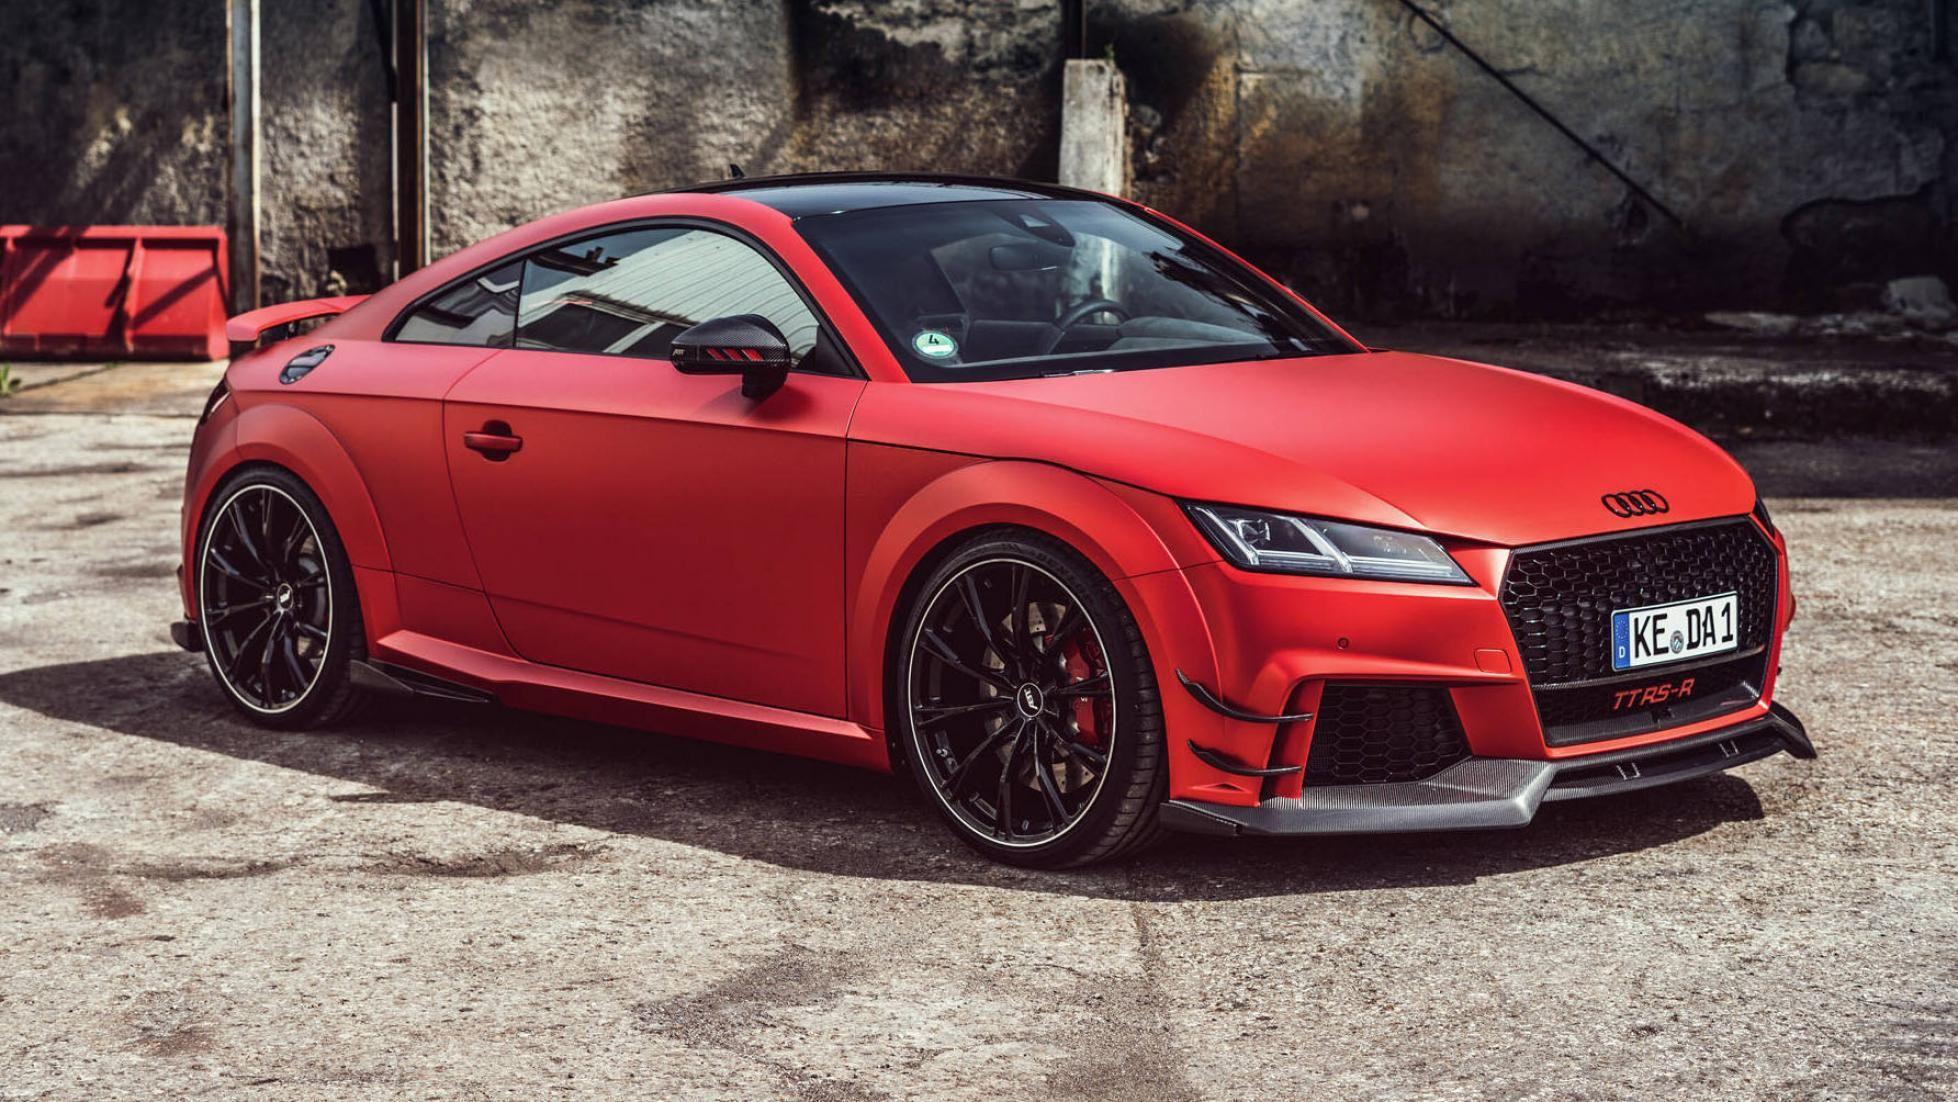 Abt Pumps New Audi Tt Rs Up To 453 Hp 338 Kw Audi Tt Rs Audi Tt Audi